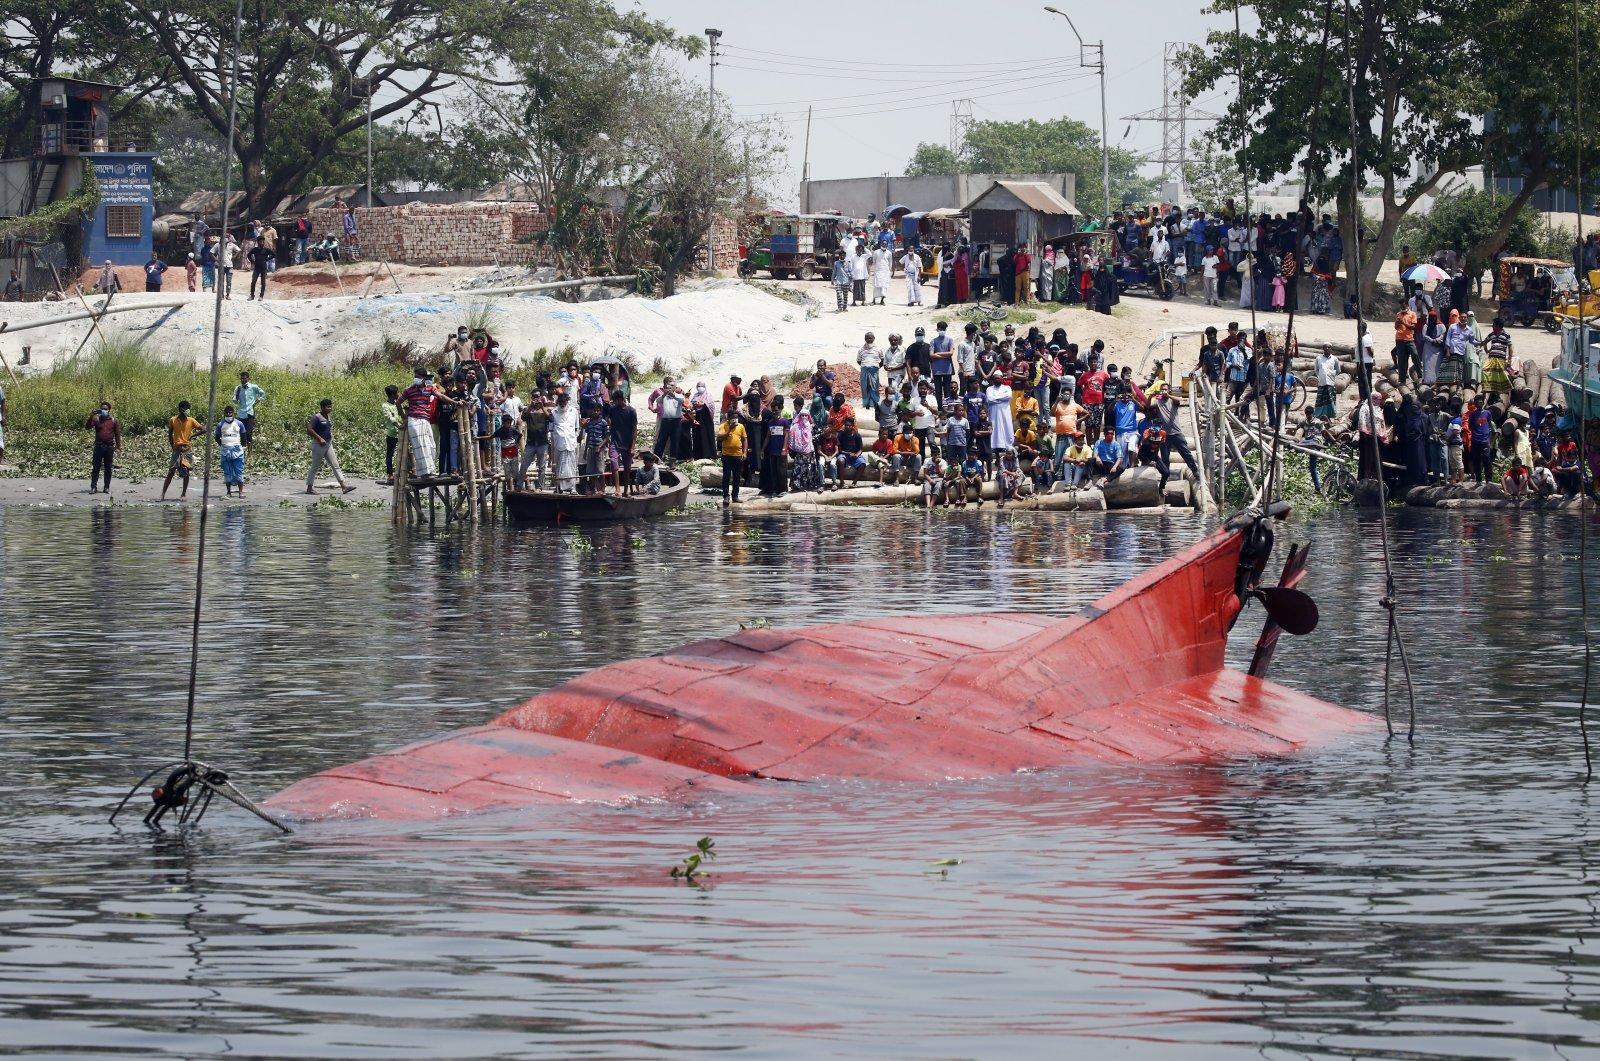 Locals gather to watch the aftermath of a boat capsizing in theShitalakkhya river in Narayanganj, Dhaka, Bangladesh, April 5, 2021. (EPA Photo)